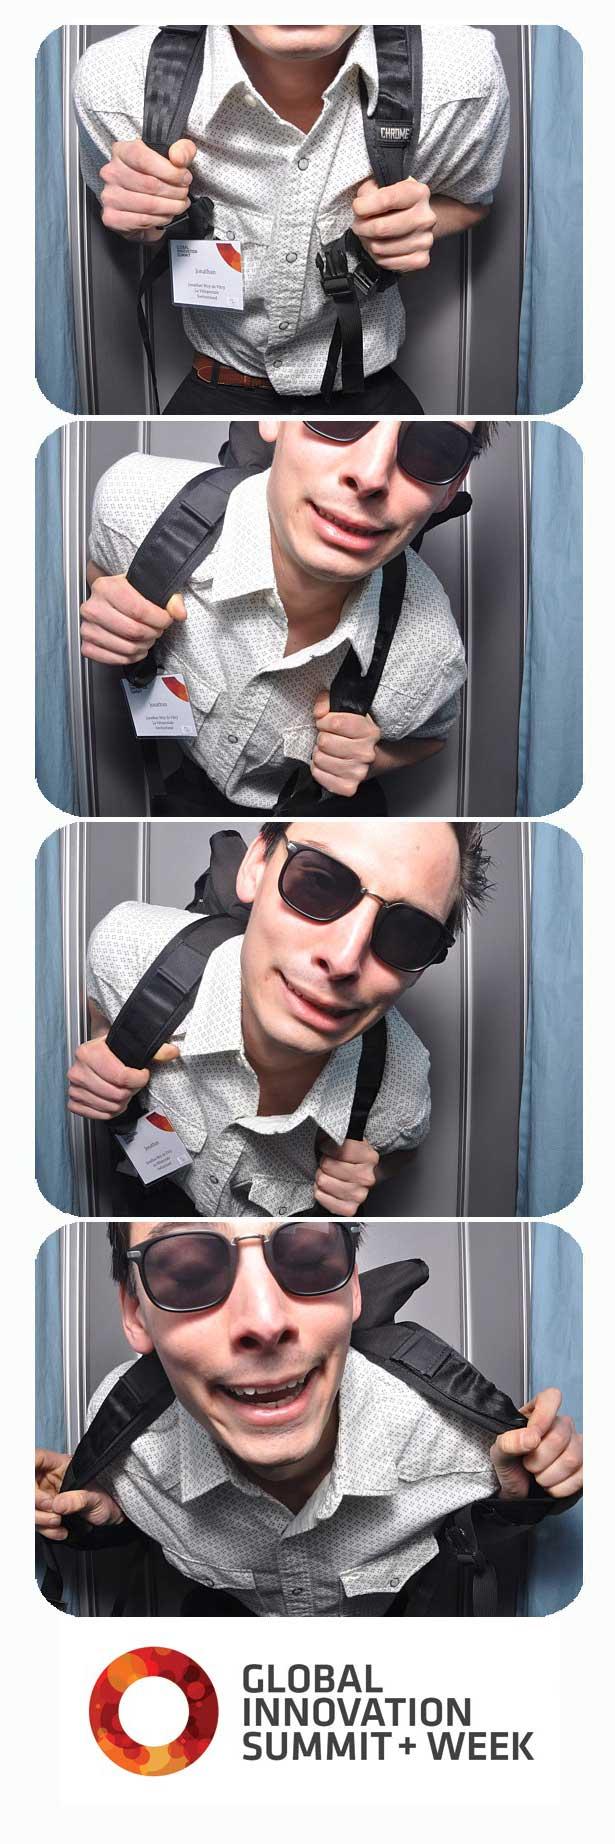 photo-booth-_441.jpg